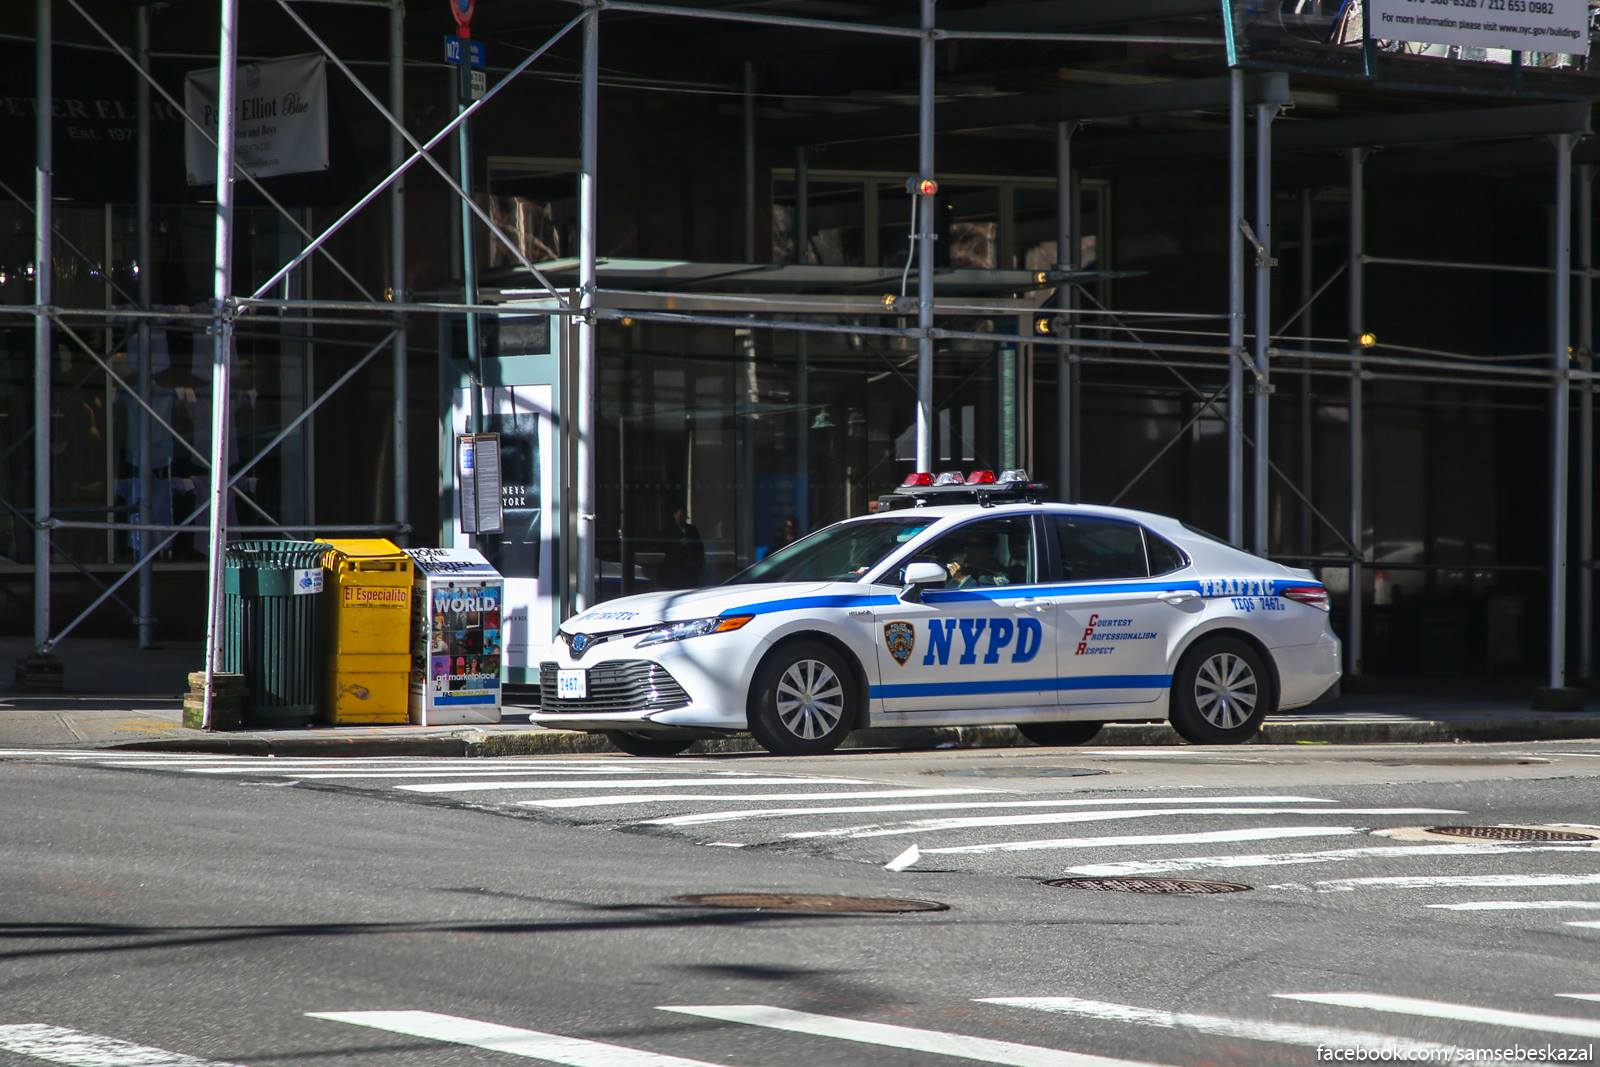 Vpervye vizu Tojotu Kamri v nʹu-jorkskoj policii (hota formalʹno, ludi kotorye na nej ezdat ne kopy).